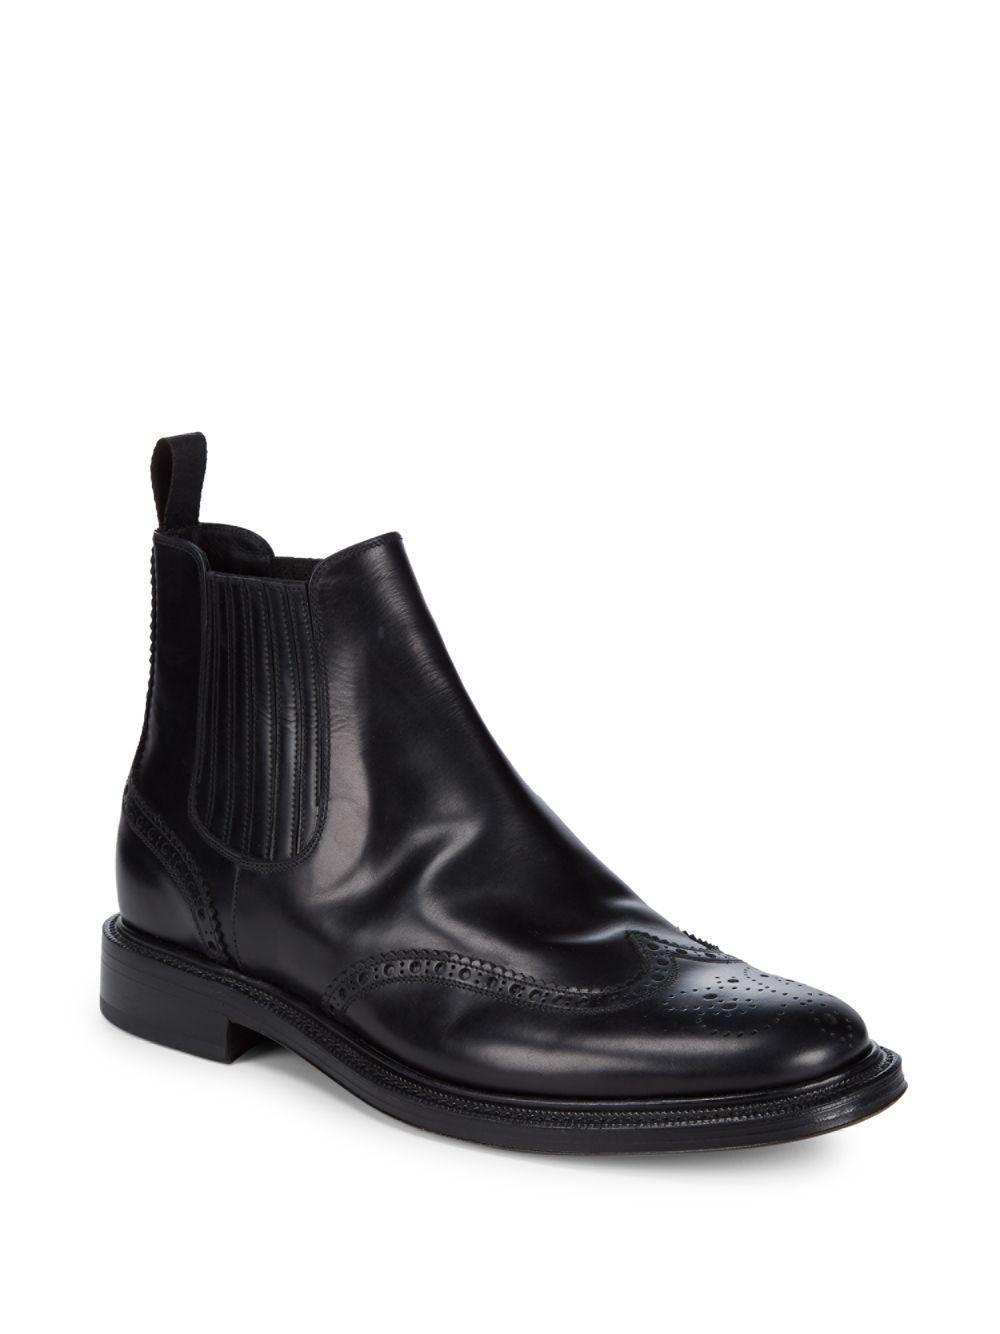 Buy Cheap Big Discount Shop For Chelsea boots 11033 leather black goodyear Santoni odiCEG